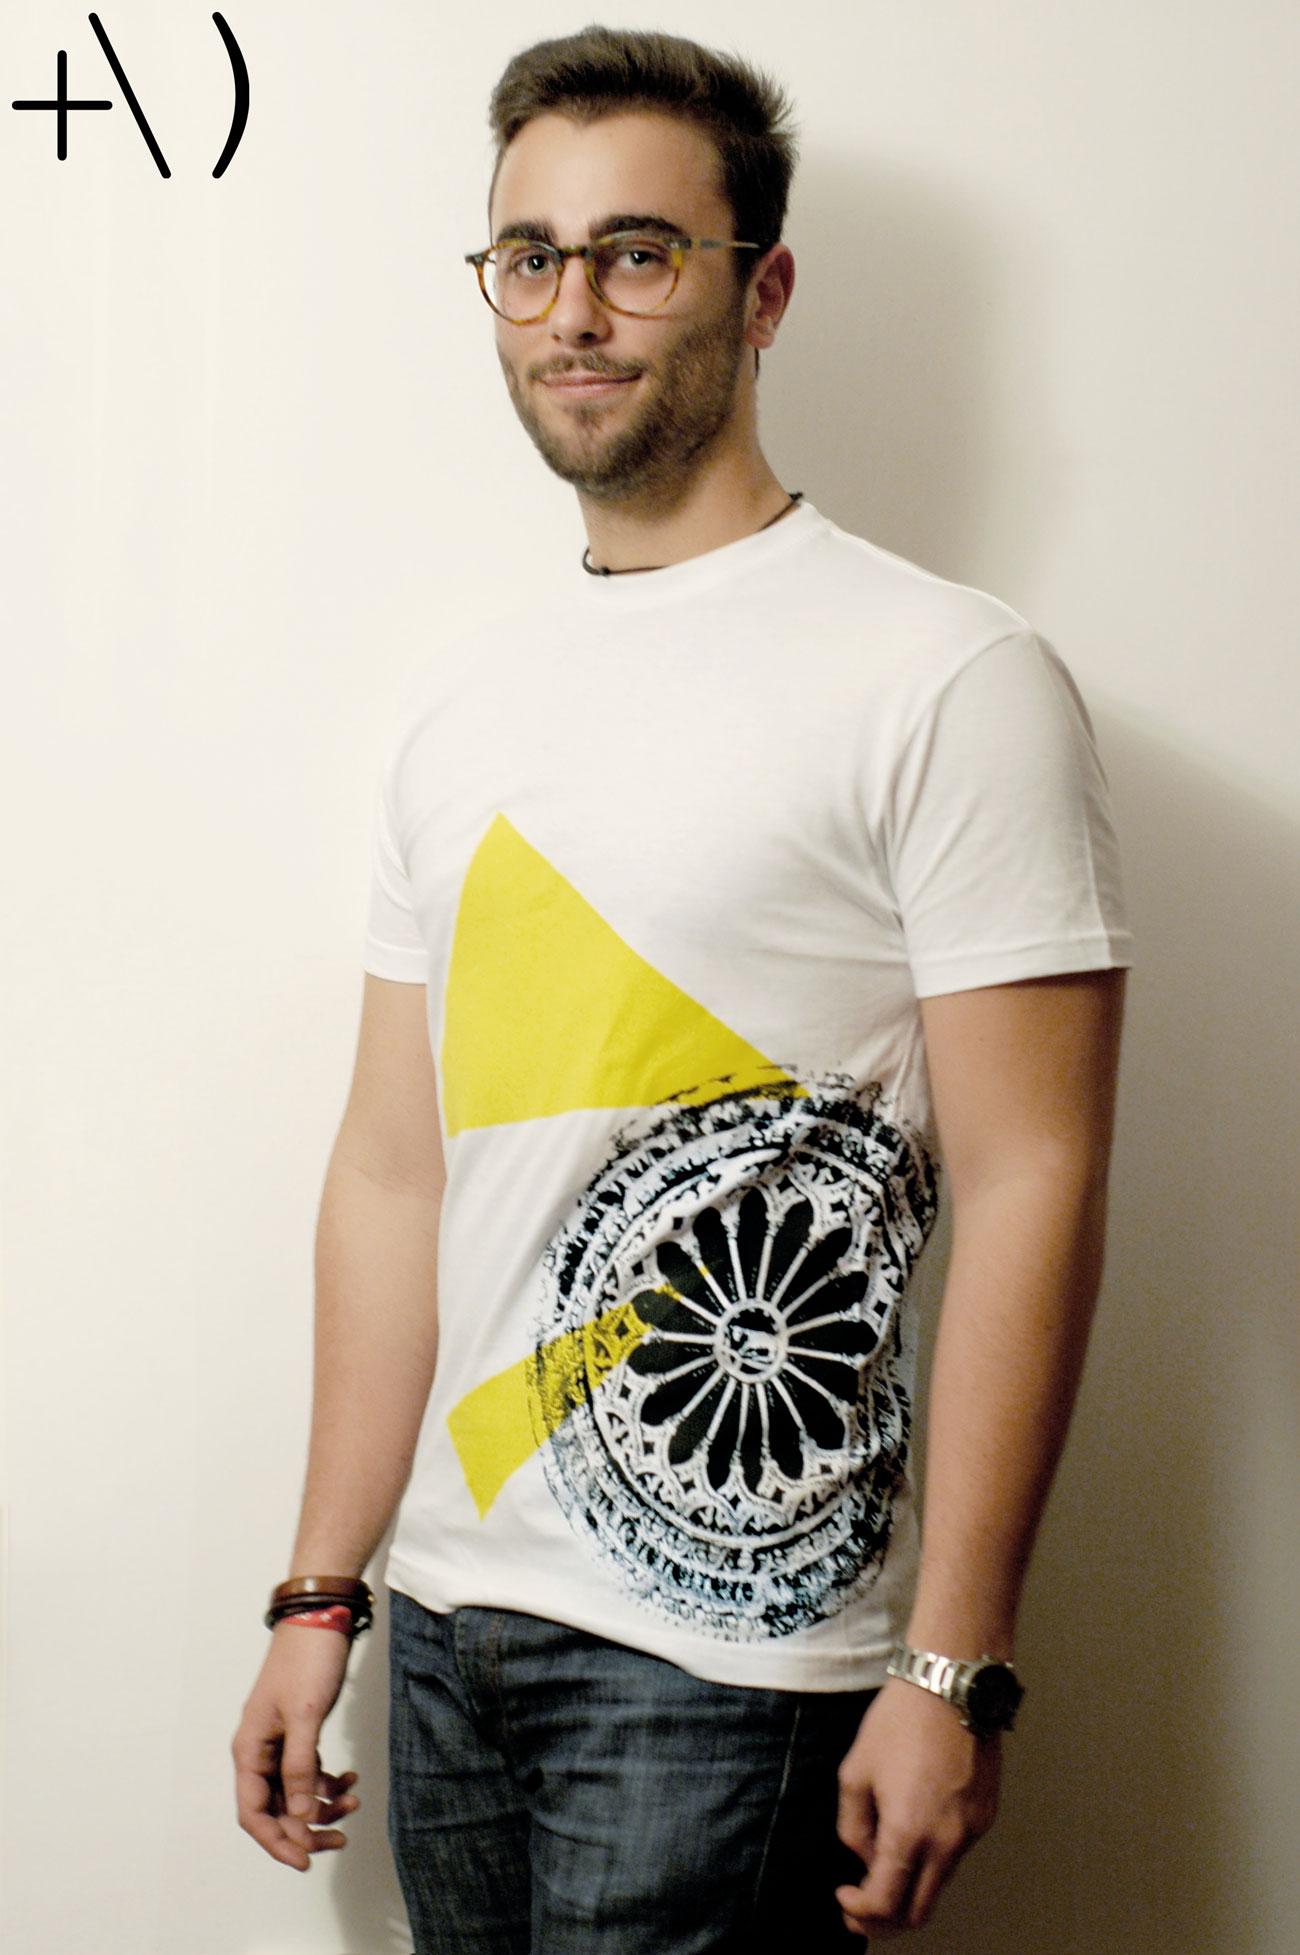 federicus 2015 male t-shirt altamura giallo